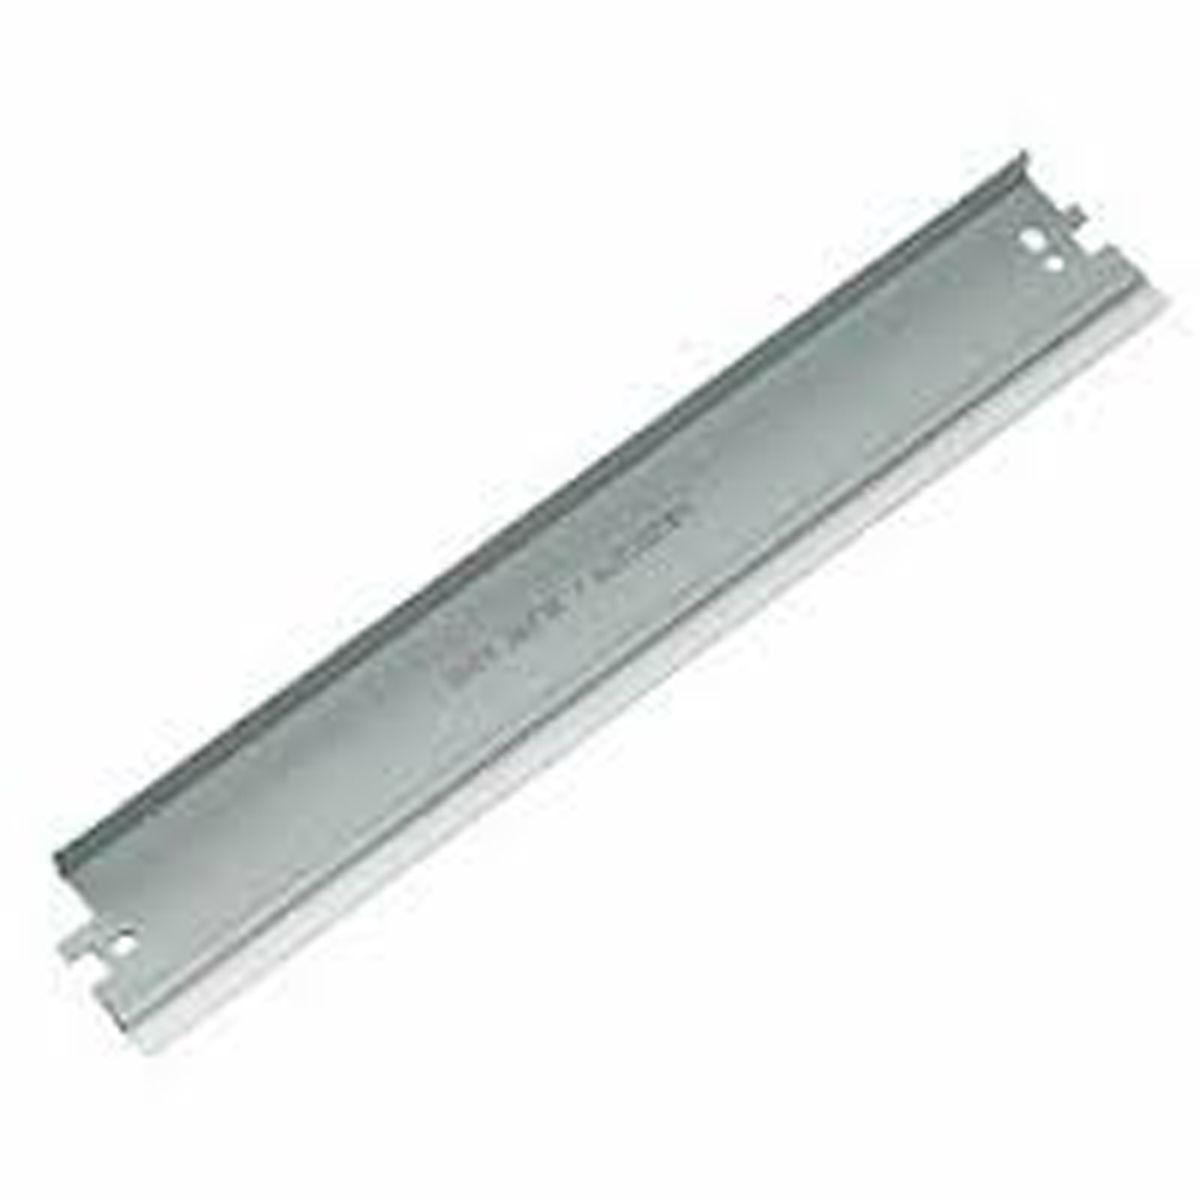 Lamina Limpeza Wiper Blade HP CF283 283A 283 - M125 M127 M127FN M226